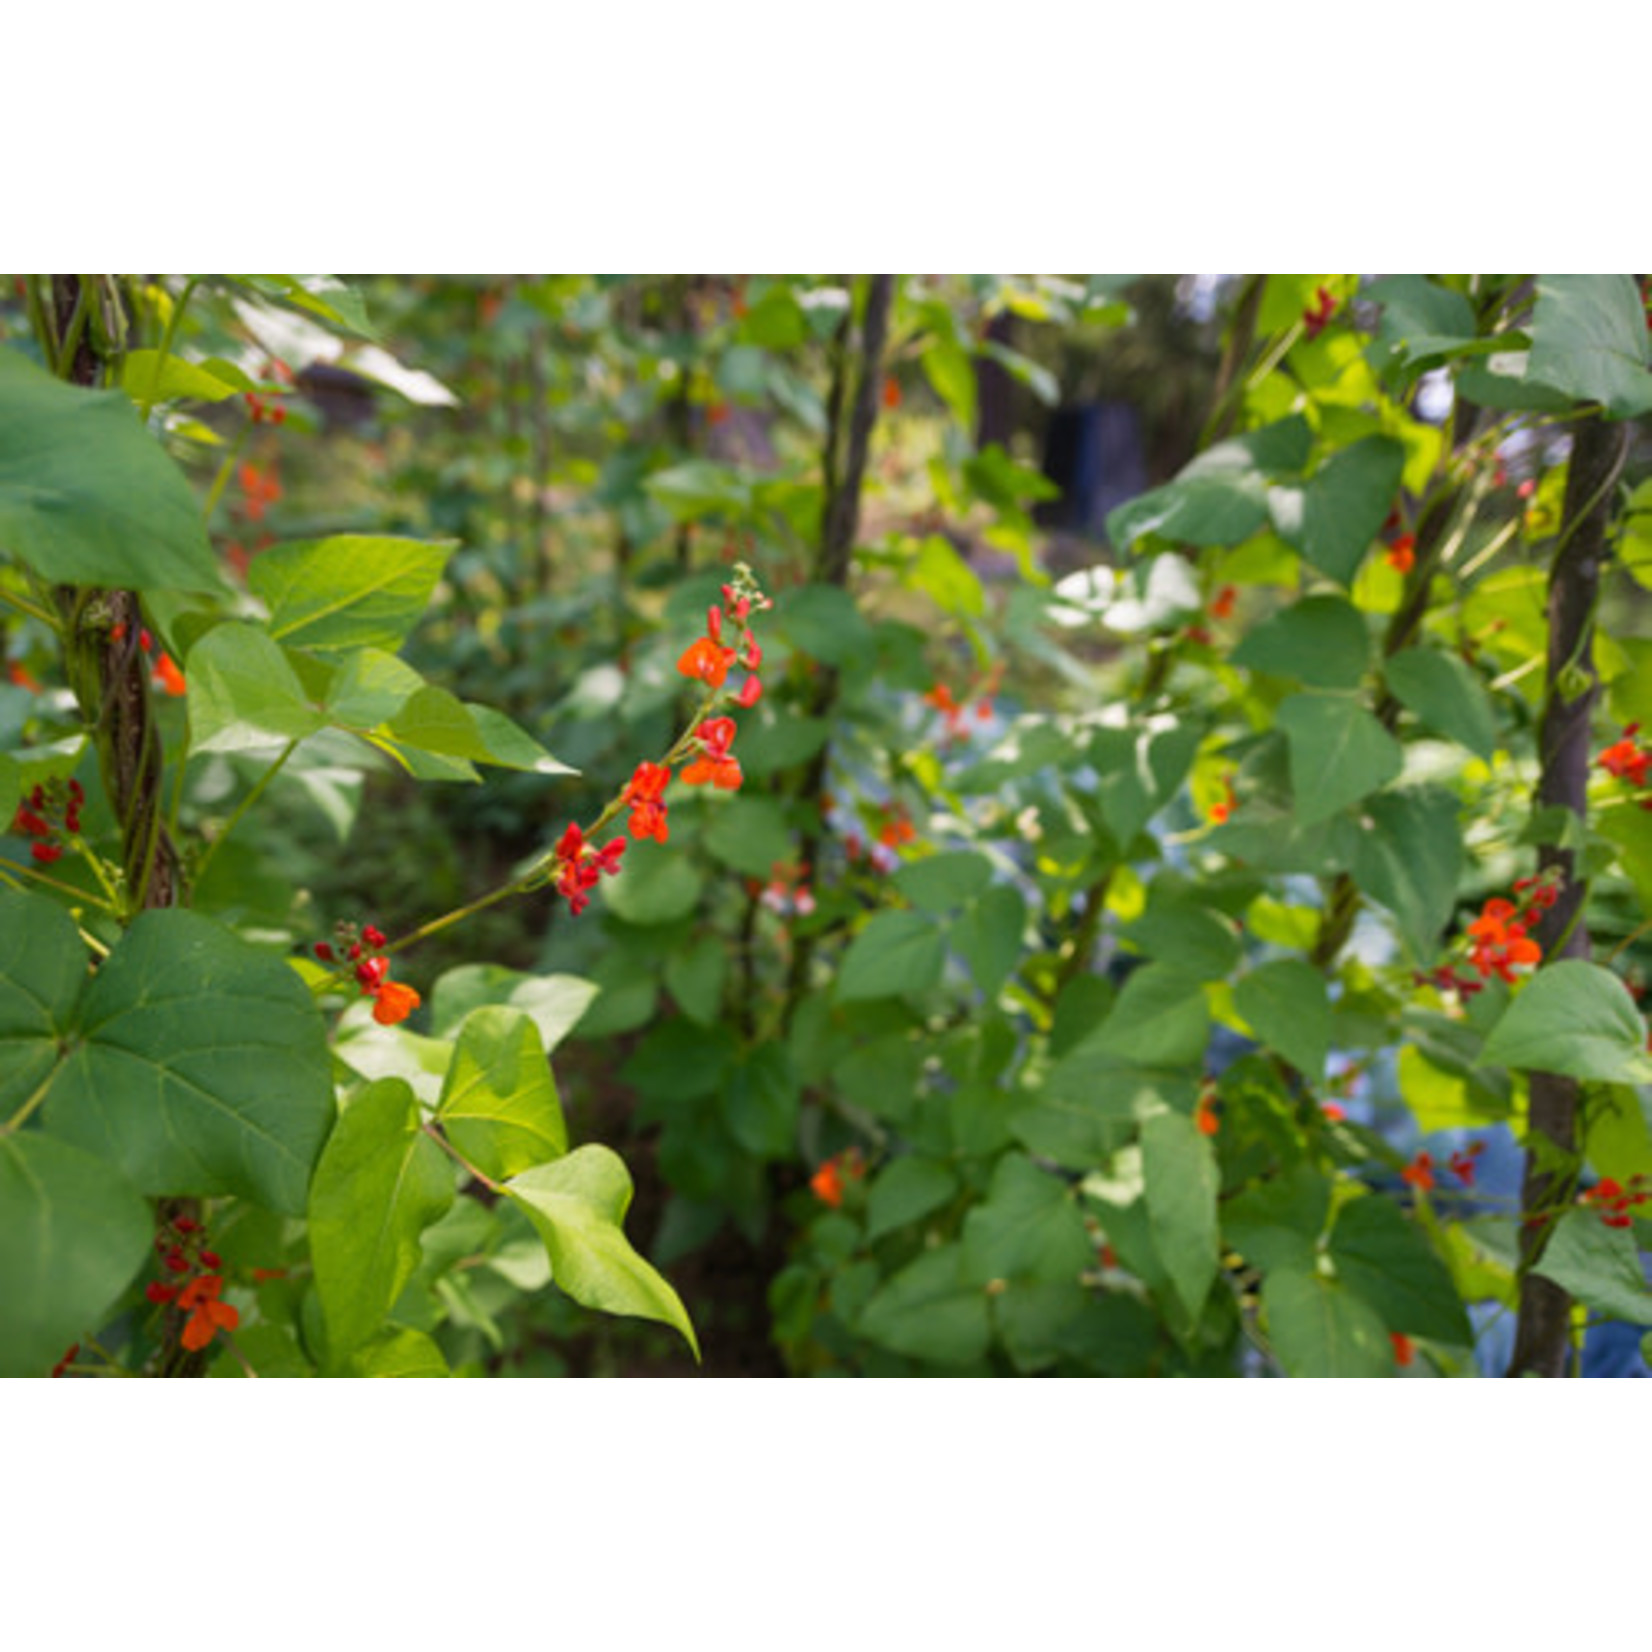 Flowering Pole Bean (seed pkg) - Scarlet Runner